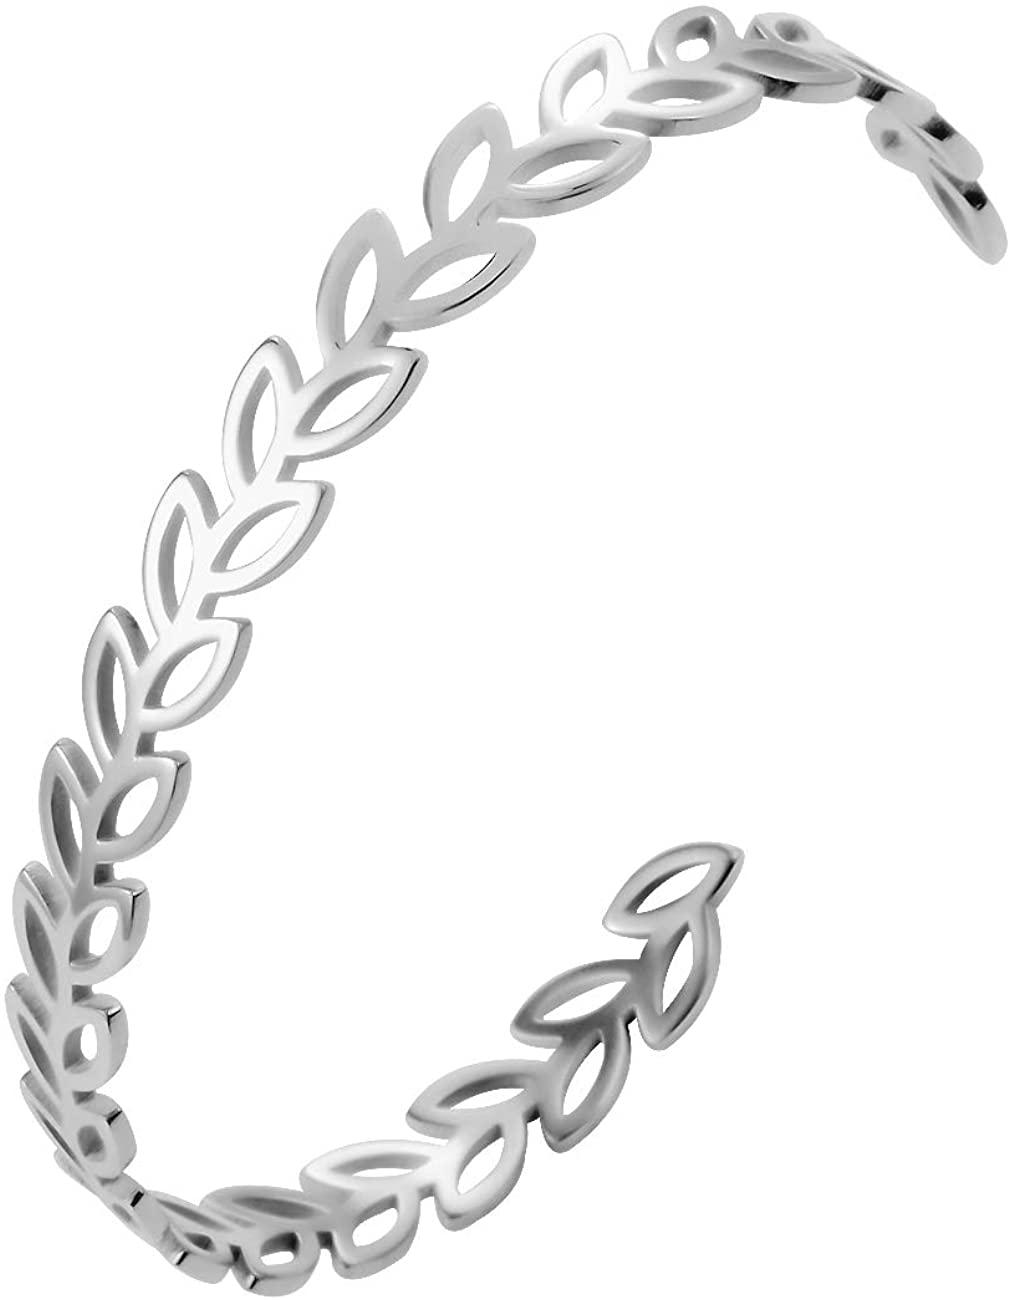 Stainless Steel Olive Leaf Adjustable Simple Cuff Bangle and Bracelet for Girls (Steel)